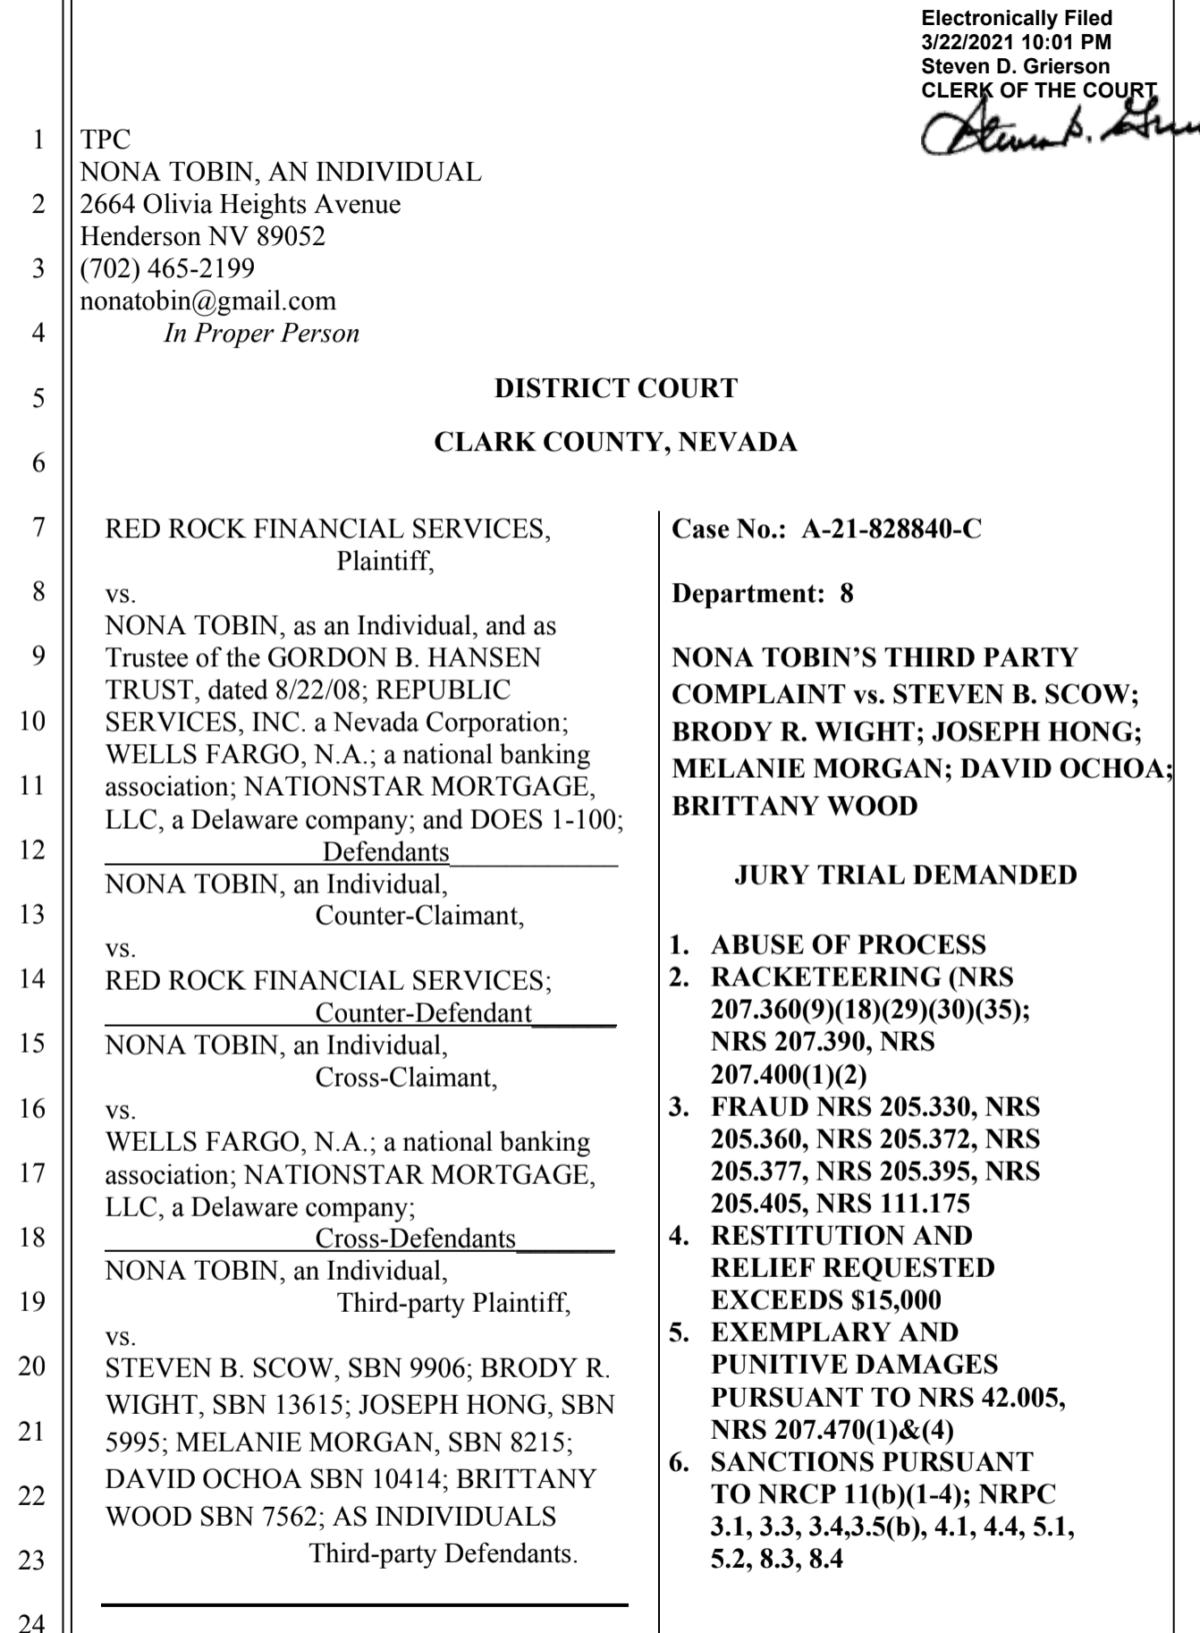 Case Detail: A-21-828840-C Nona Tobin vs. banks, debt collectors & attorneys